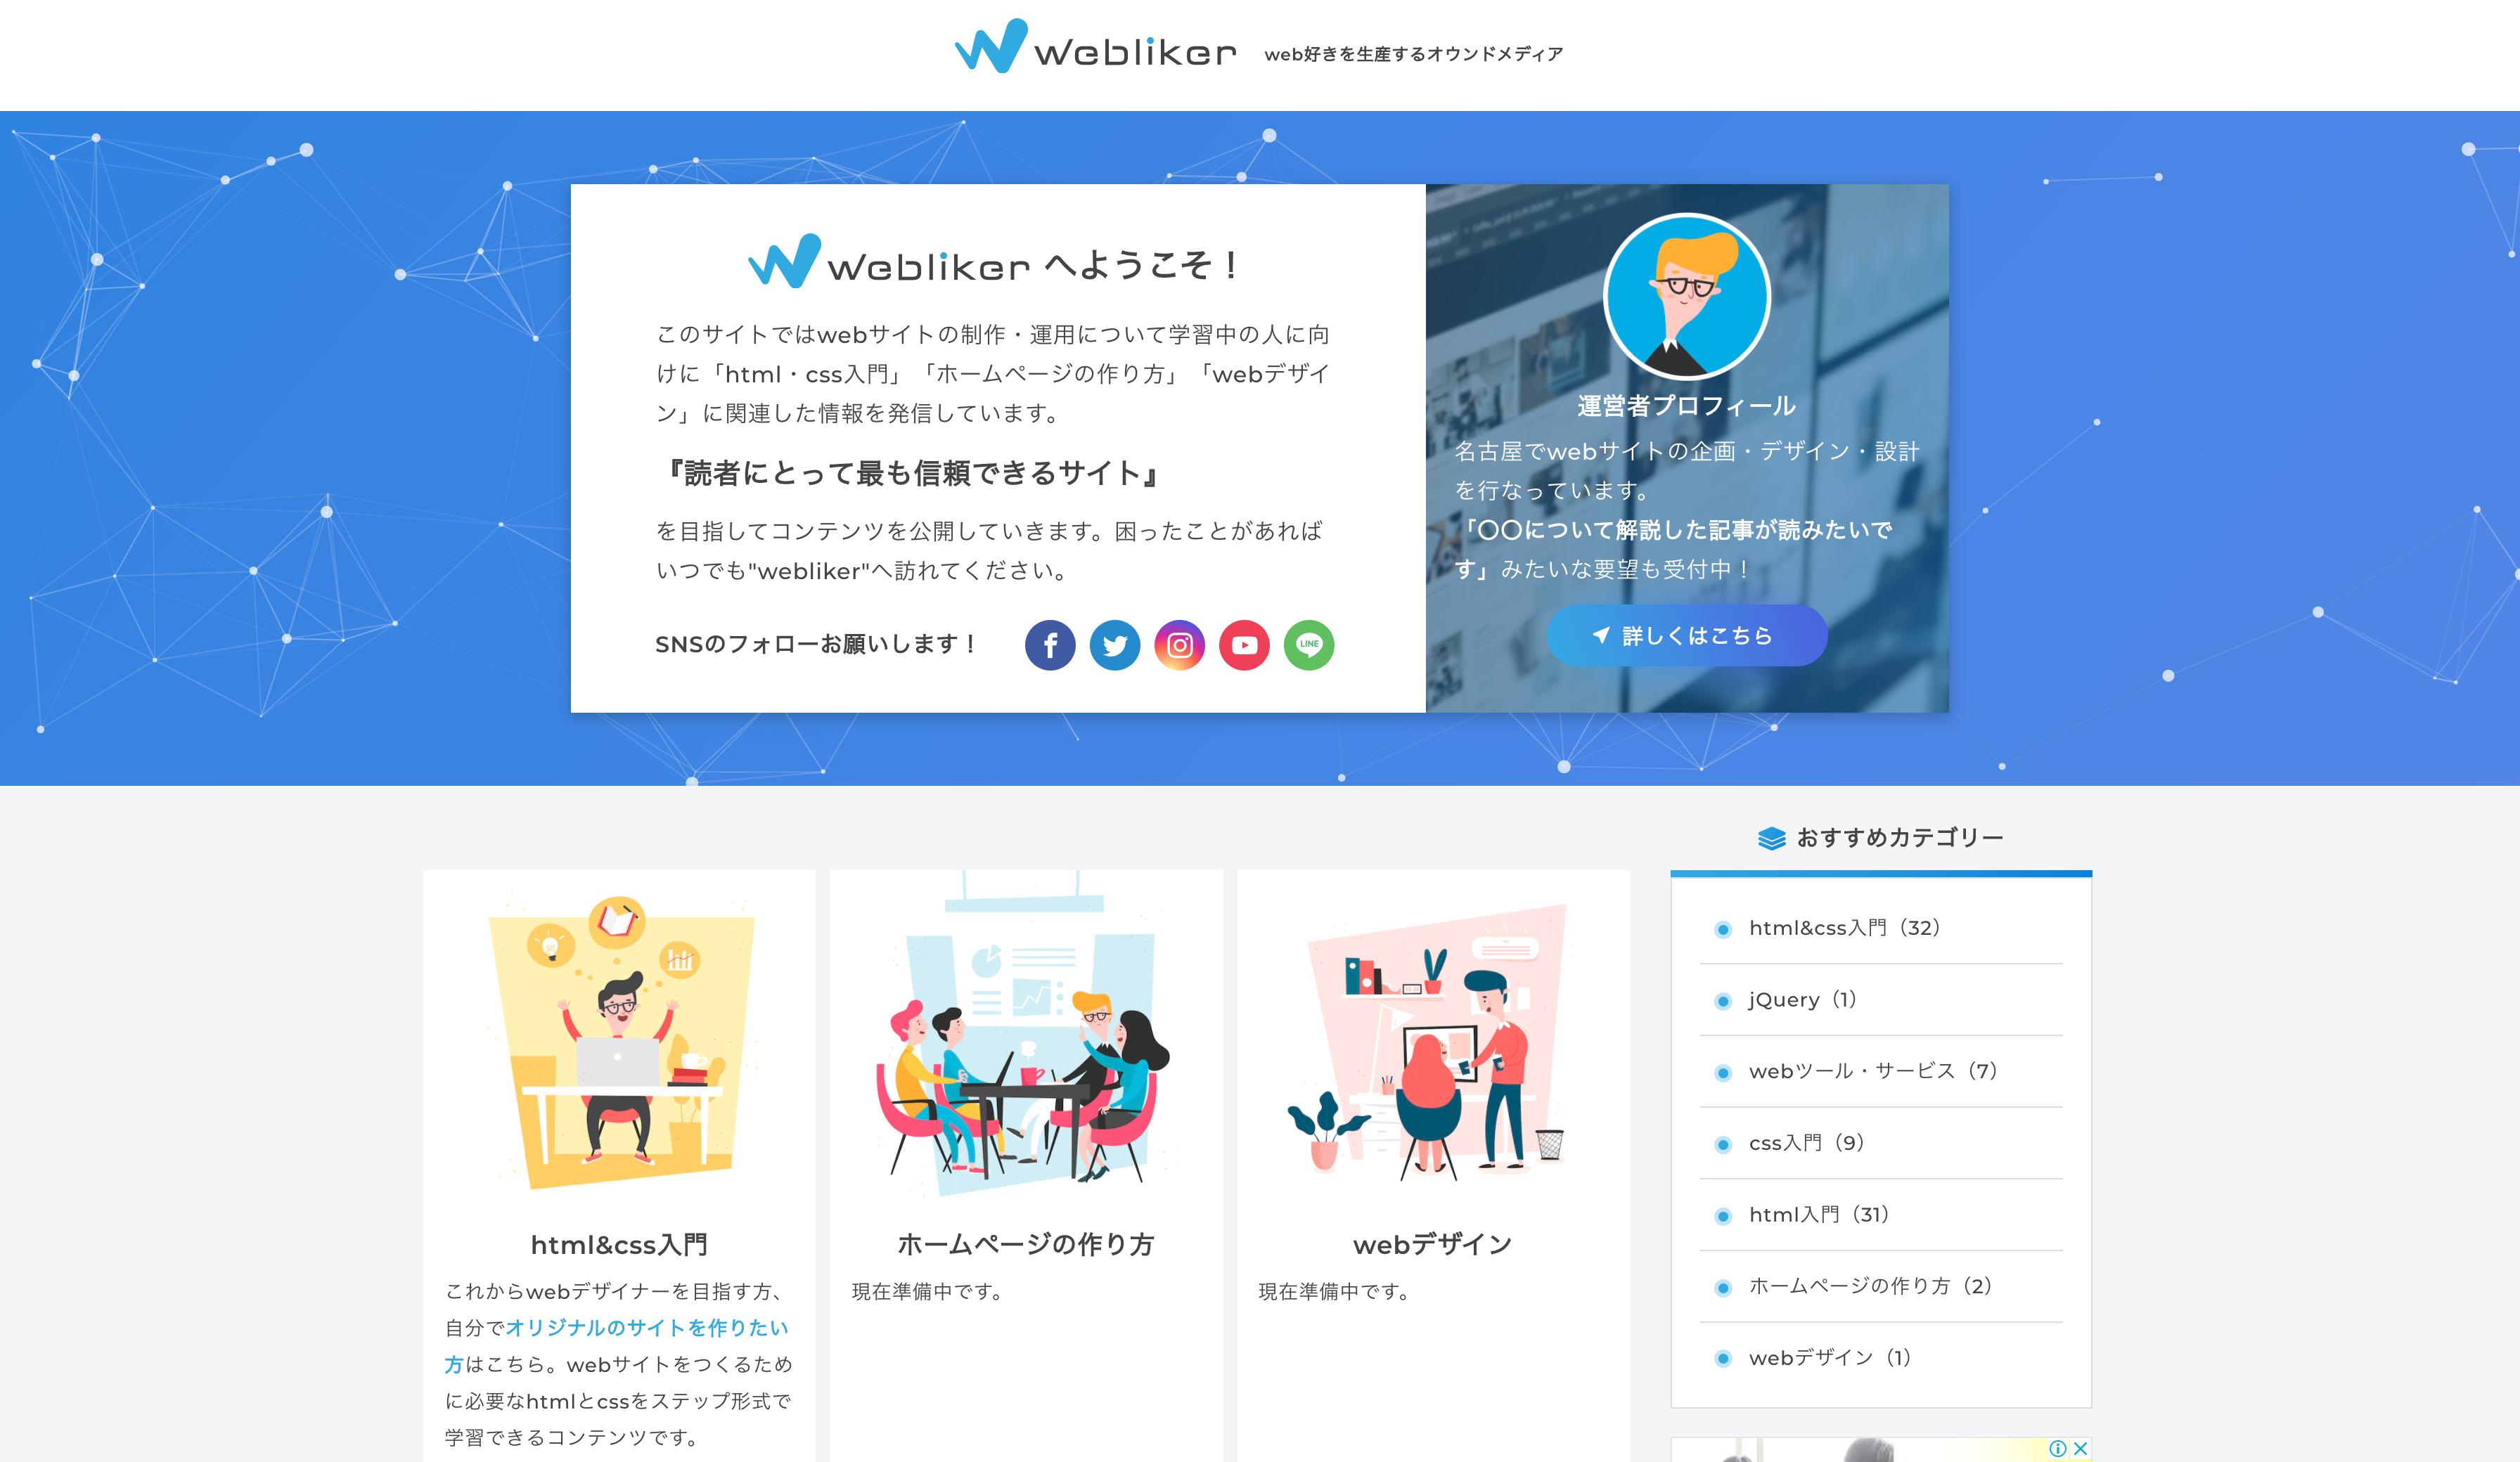 webliker.png